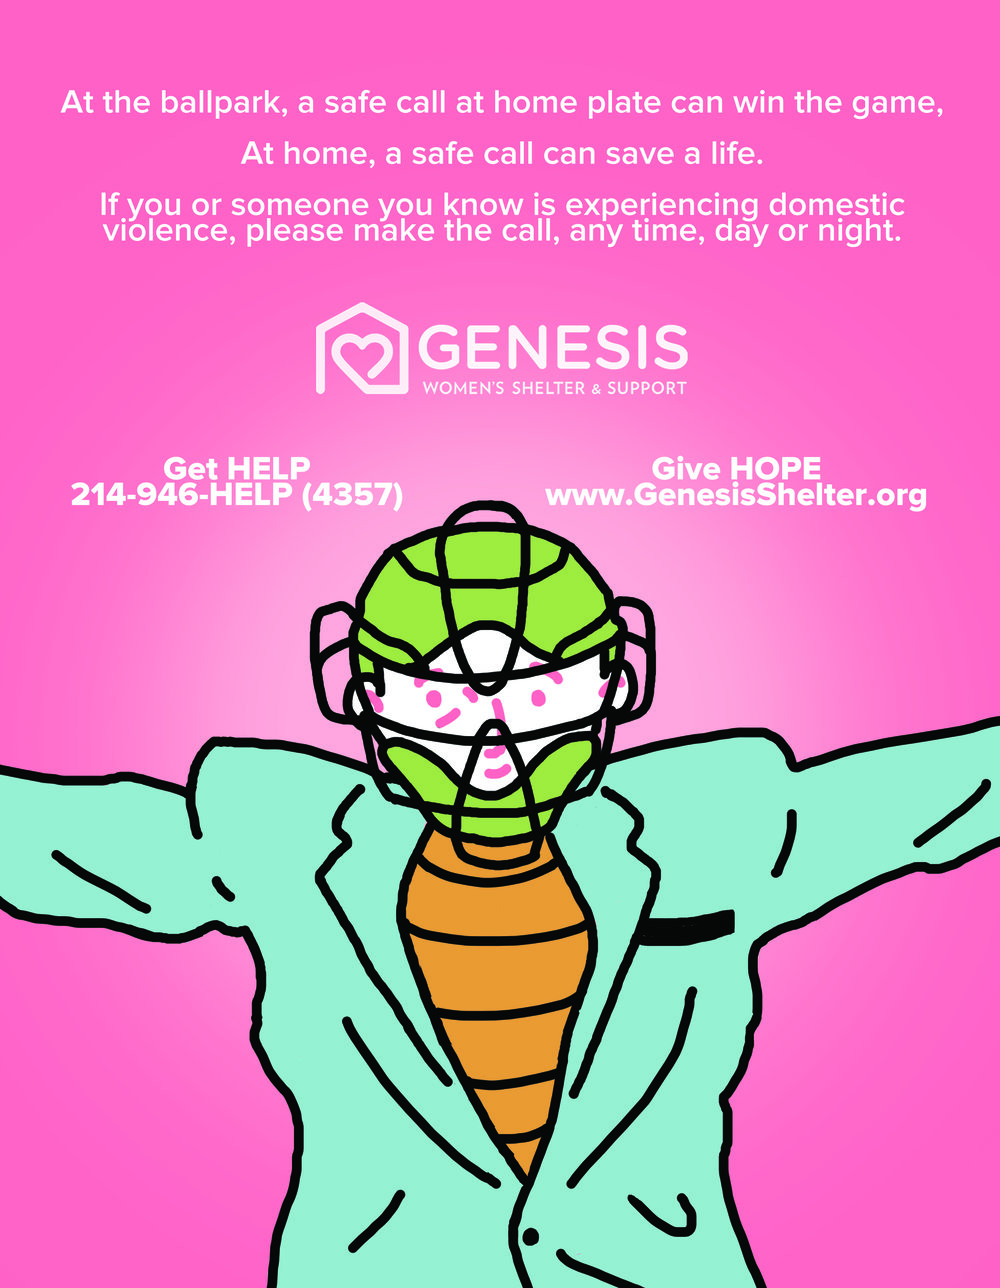 Genesis Women's Shelter Ad - Texas Rangers